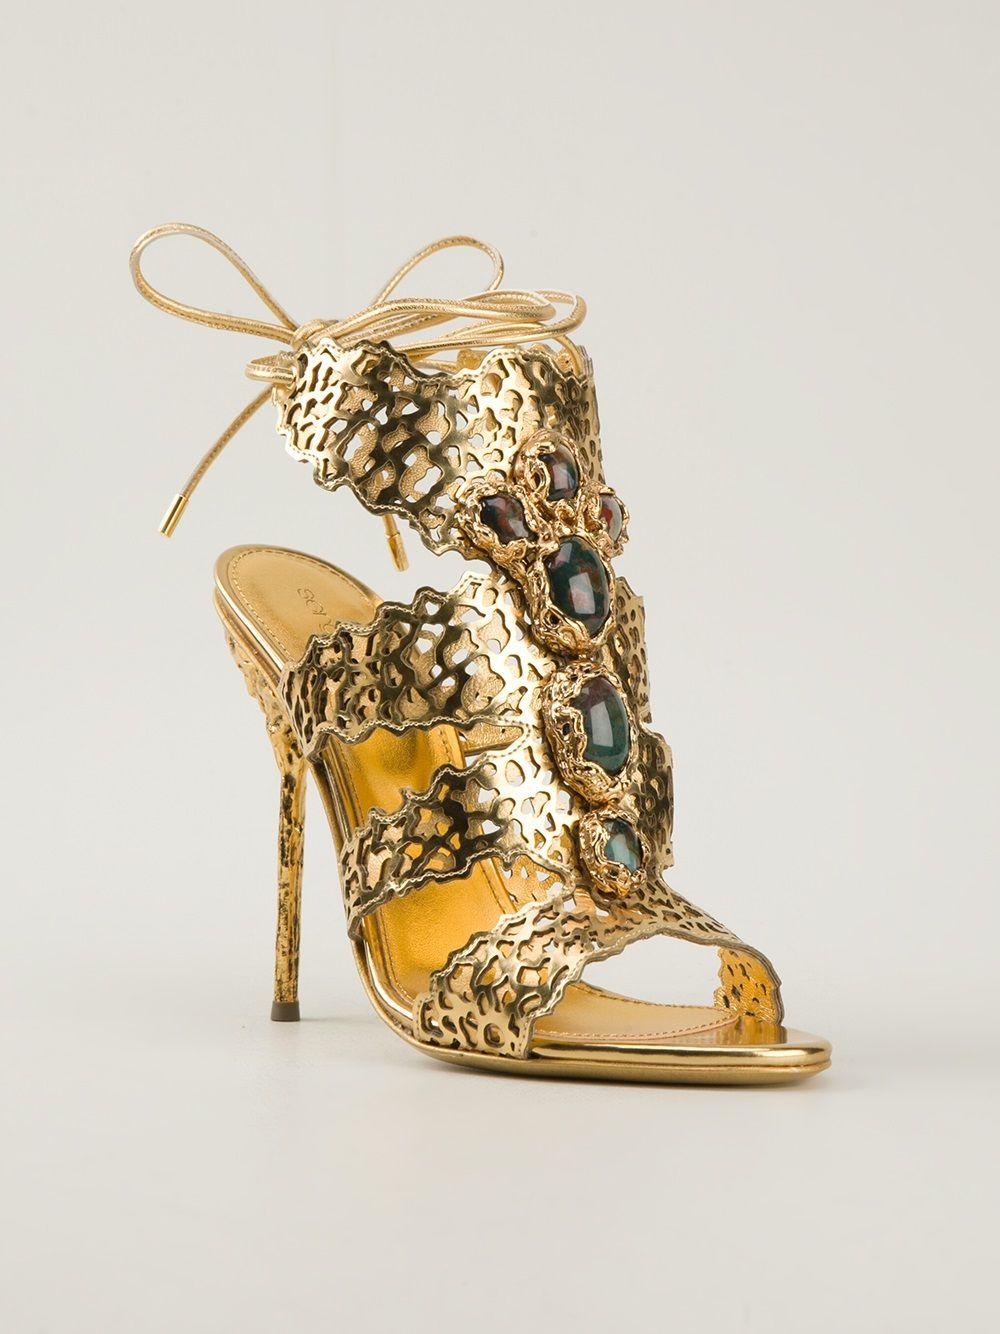 5b22a6df2f SERGIO ROSSI - Sandália dourada 6. SERGIO ROSSI - Sandália dourada 6 Sapatos  Importados